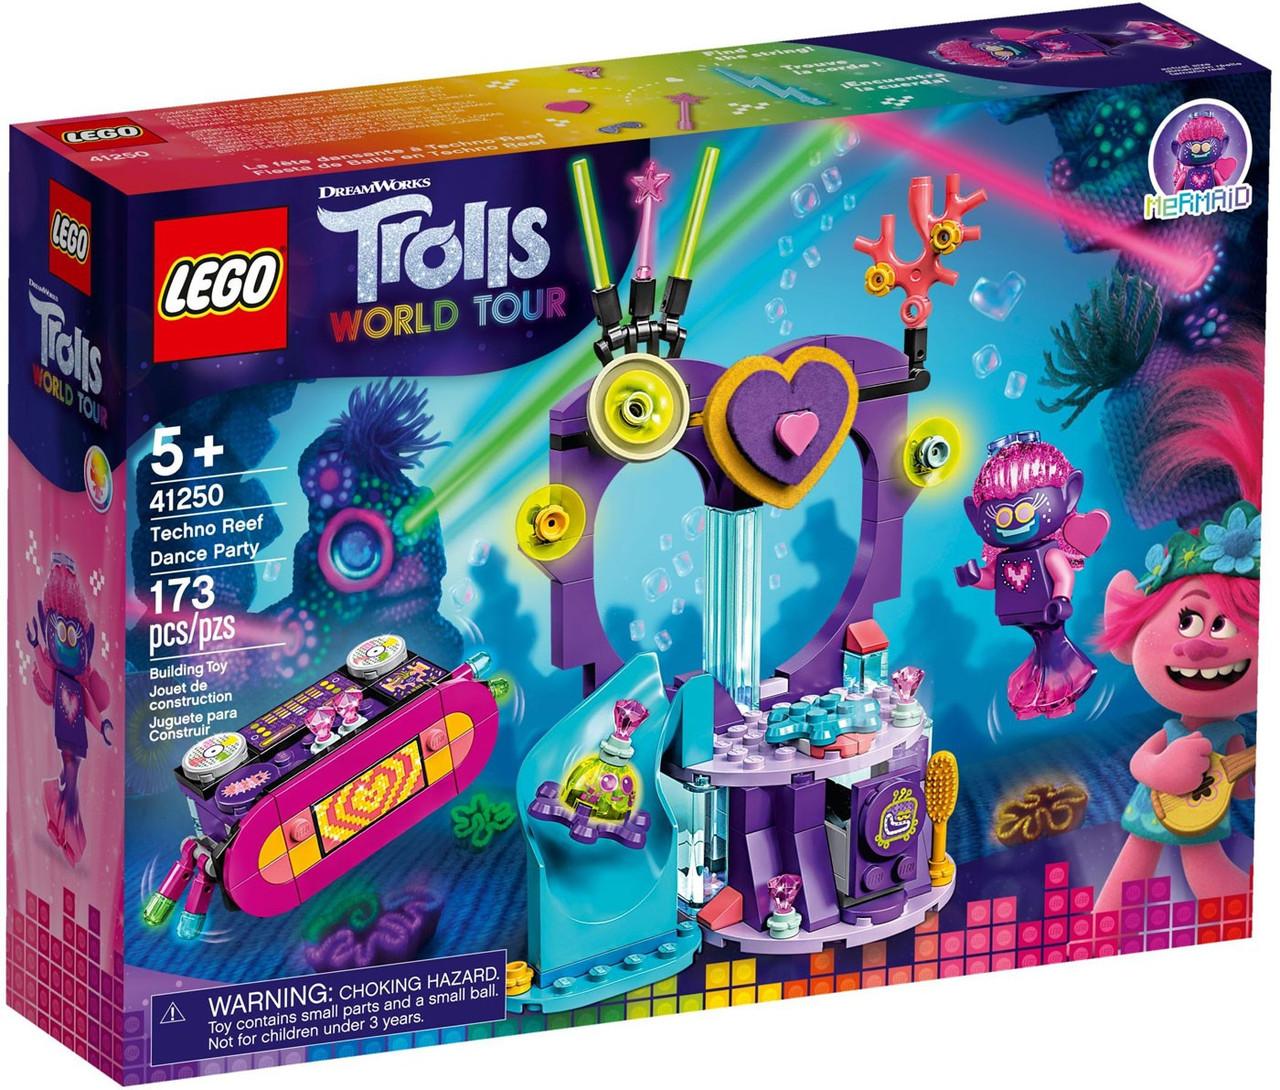 Lego Trolls World Tour Techno Reef Dance Party Set 41250 Toywiz